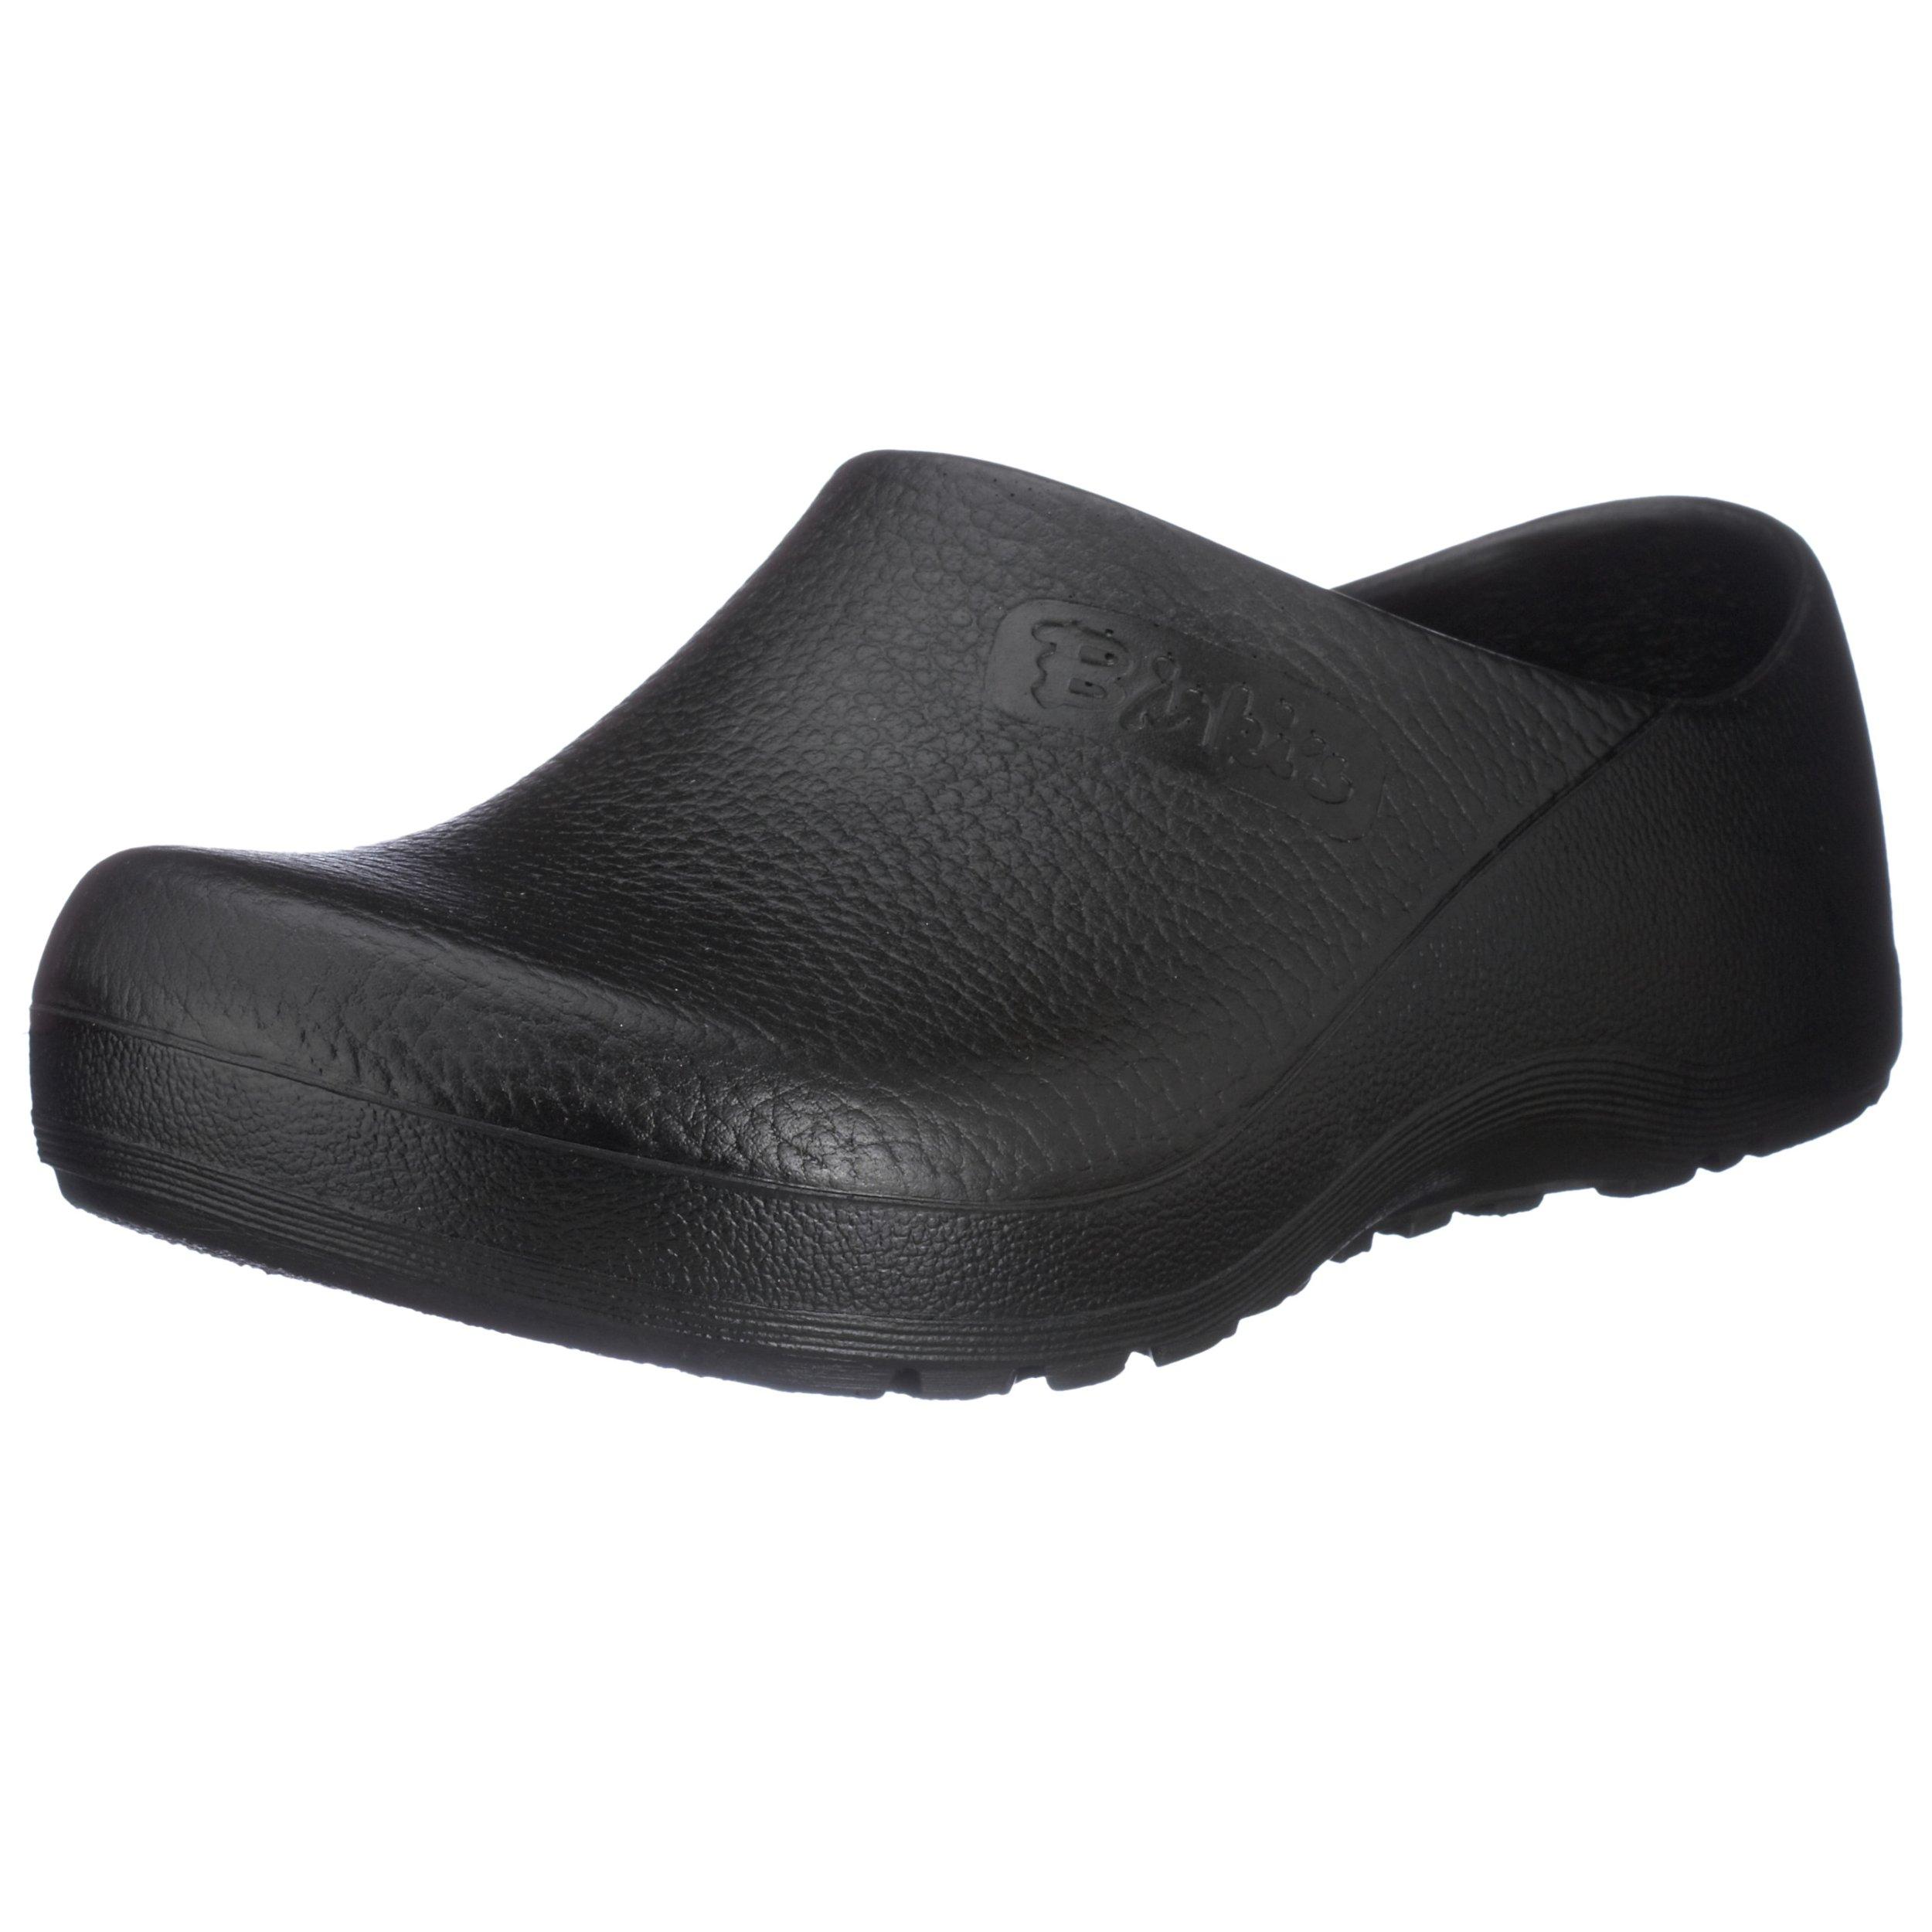 3e01870871a259 Get Quotations · Birkenstock Professional Unisex Profi Birki Slip Resistant  Work Shoe